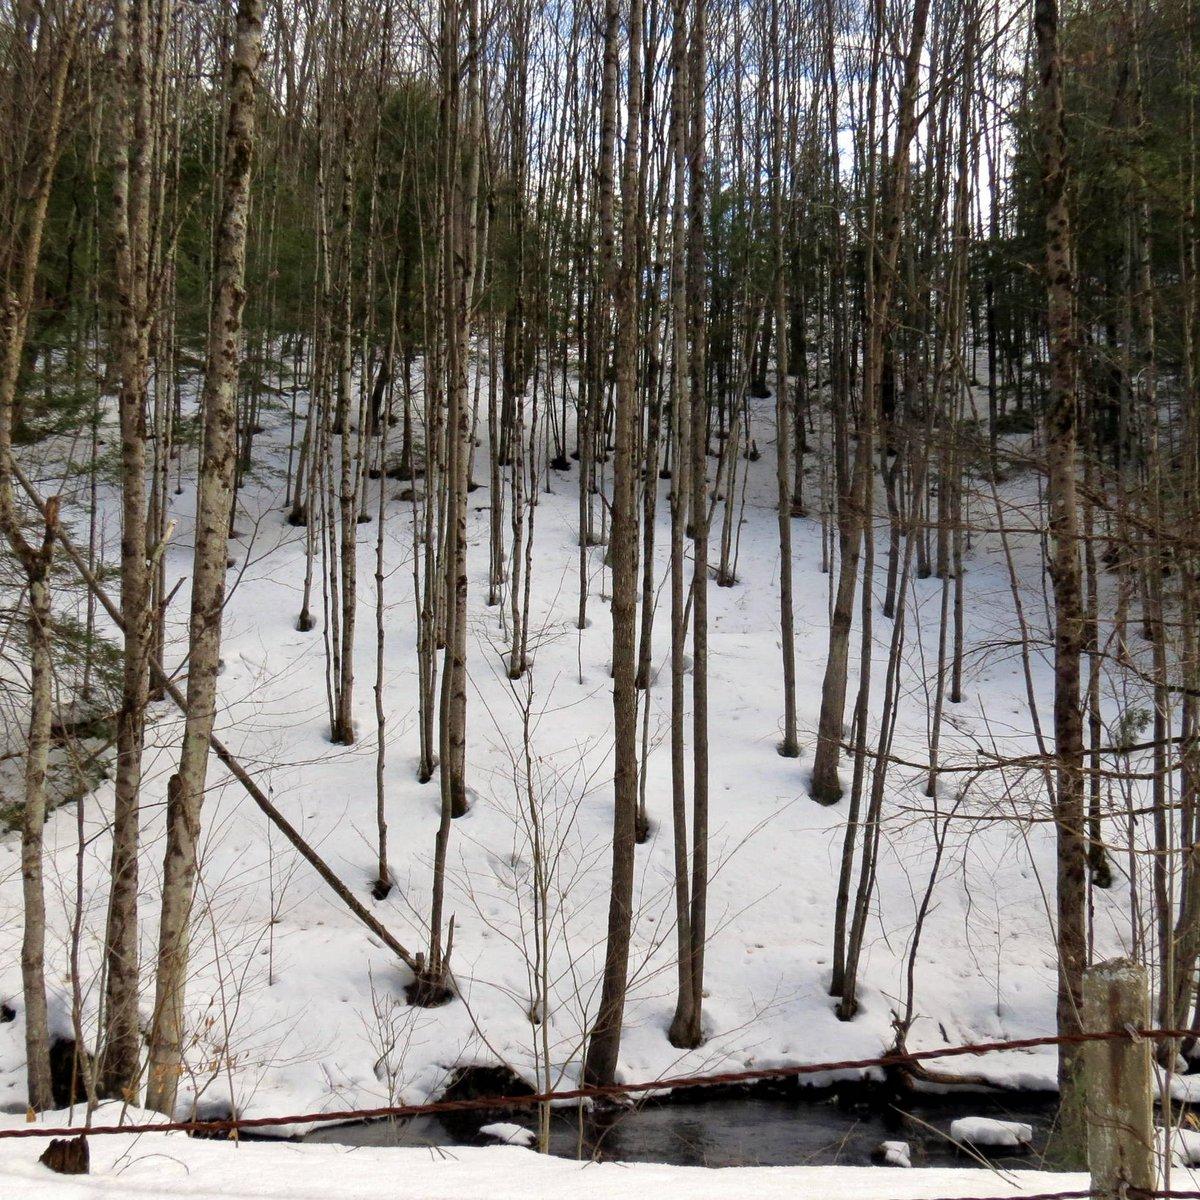 3. Snowy Hillside